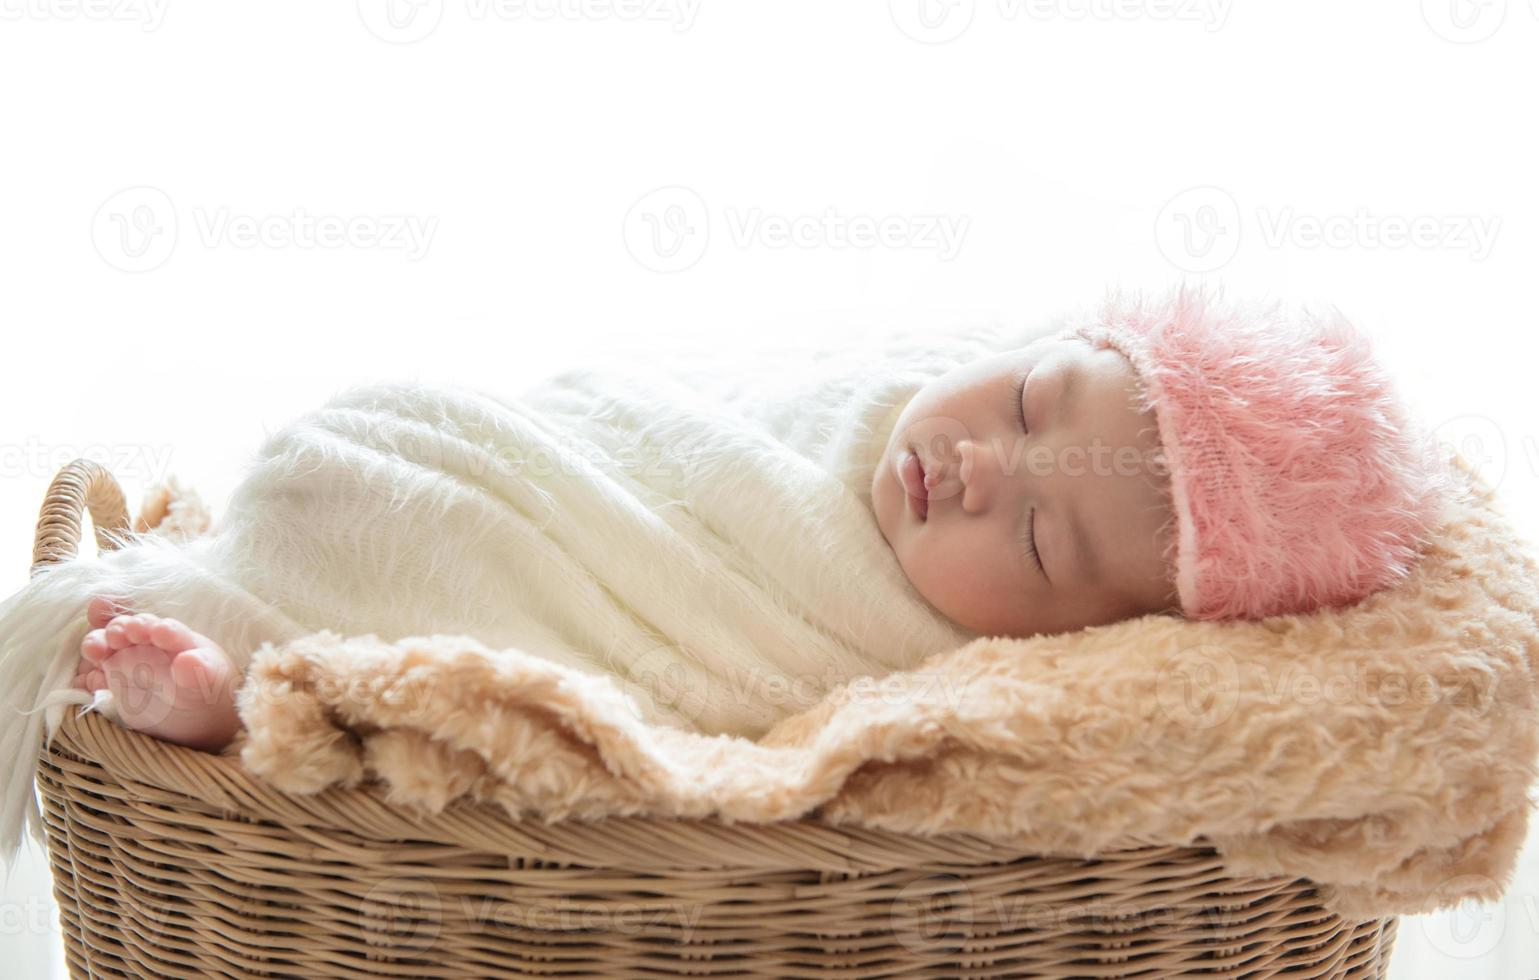 nyfött behandla som ett barn sova i en korg på vit bakgrund foto